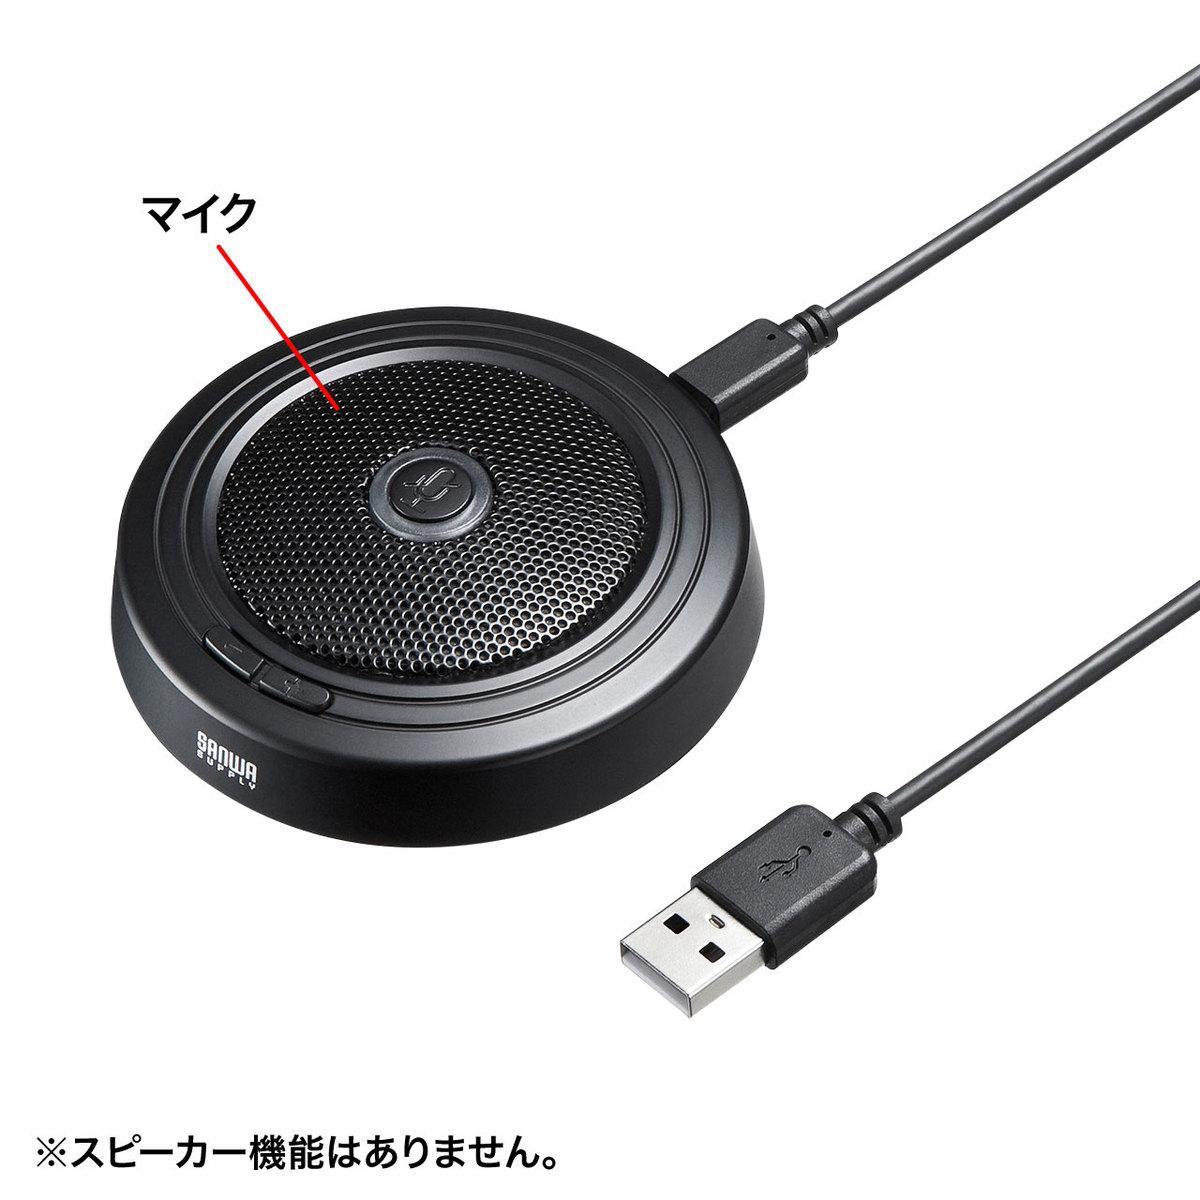 [MM-MCUSB33] WEB会議高感度USBマイク